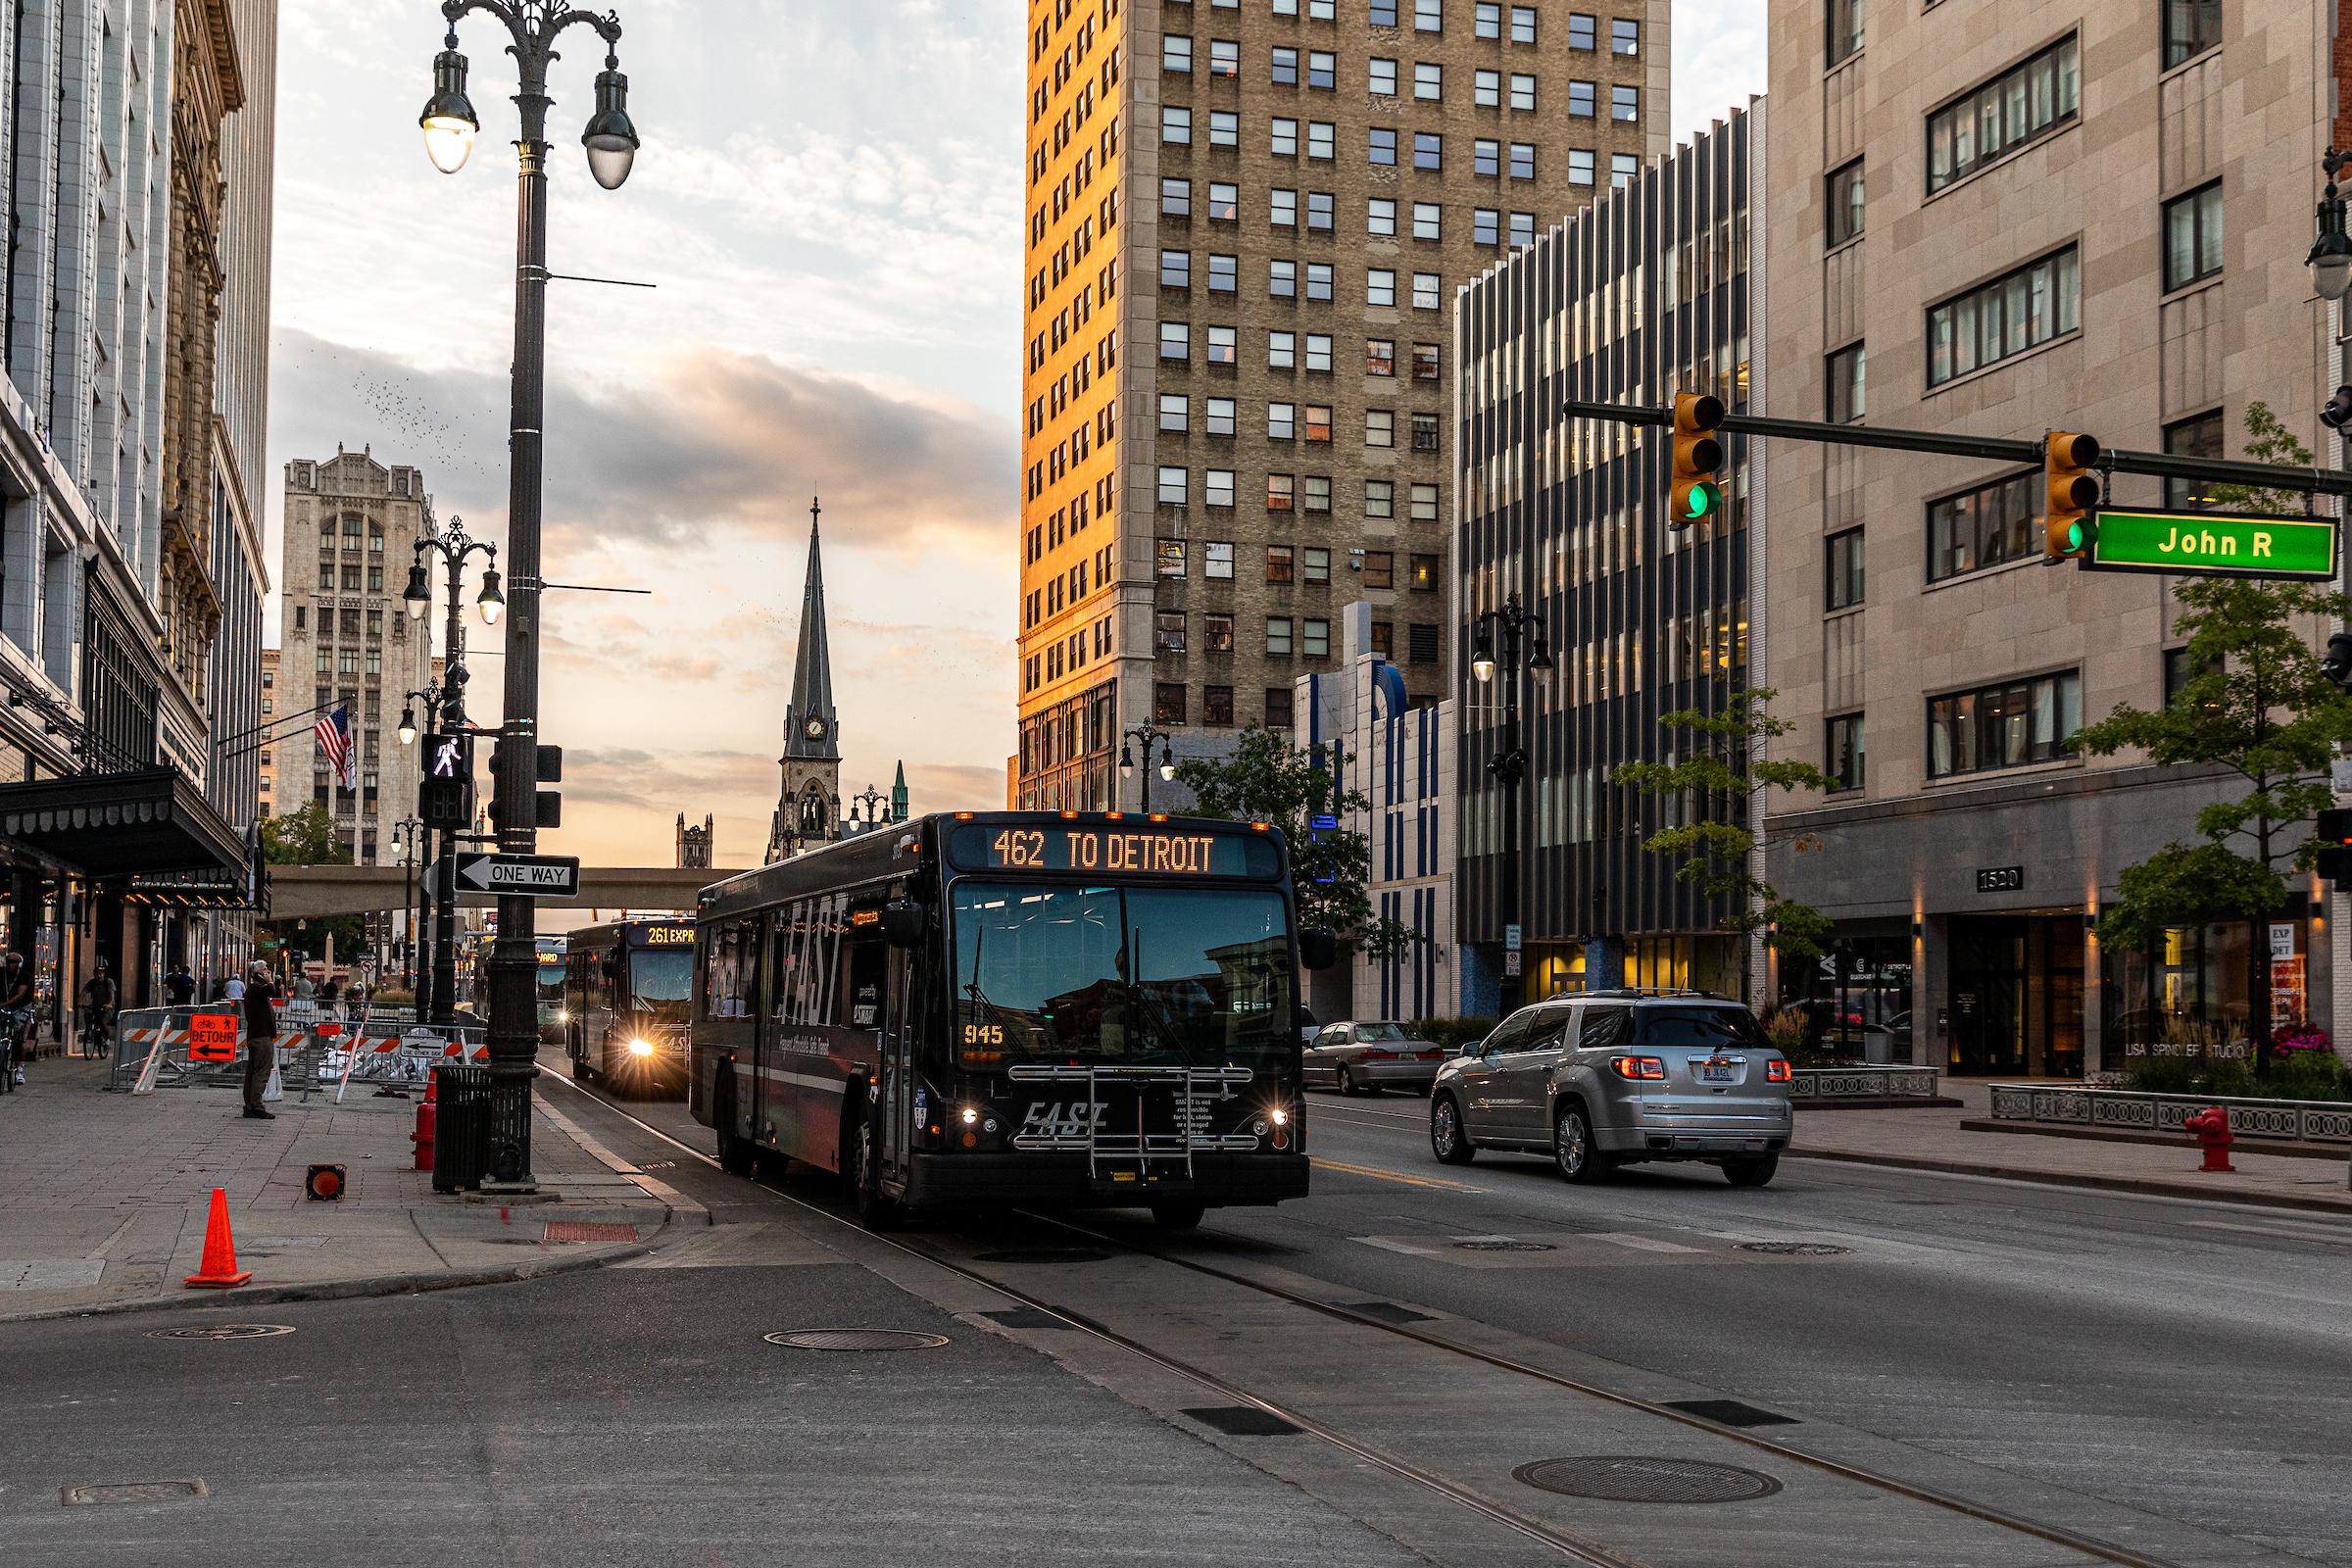 A black bus drives down a boulevard between tall buildings.